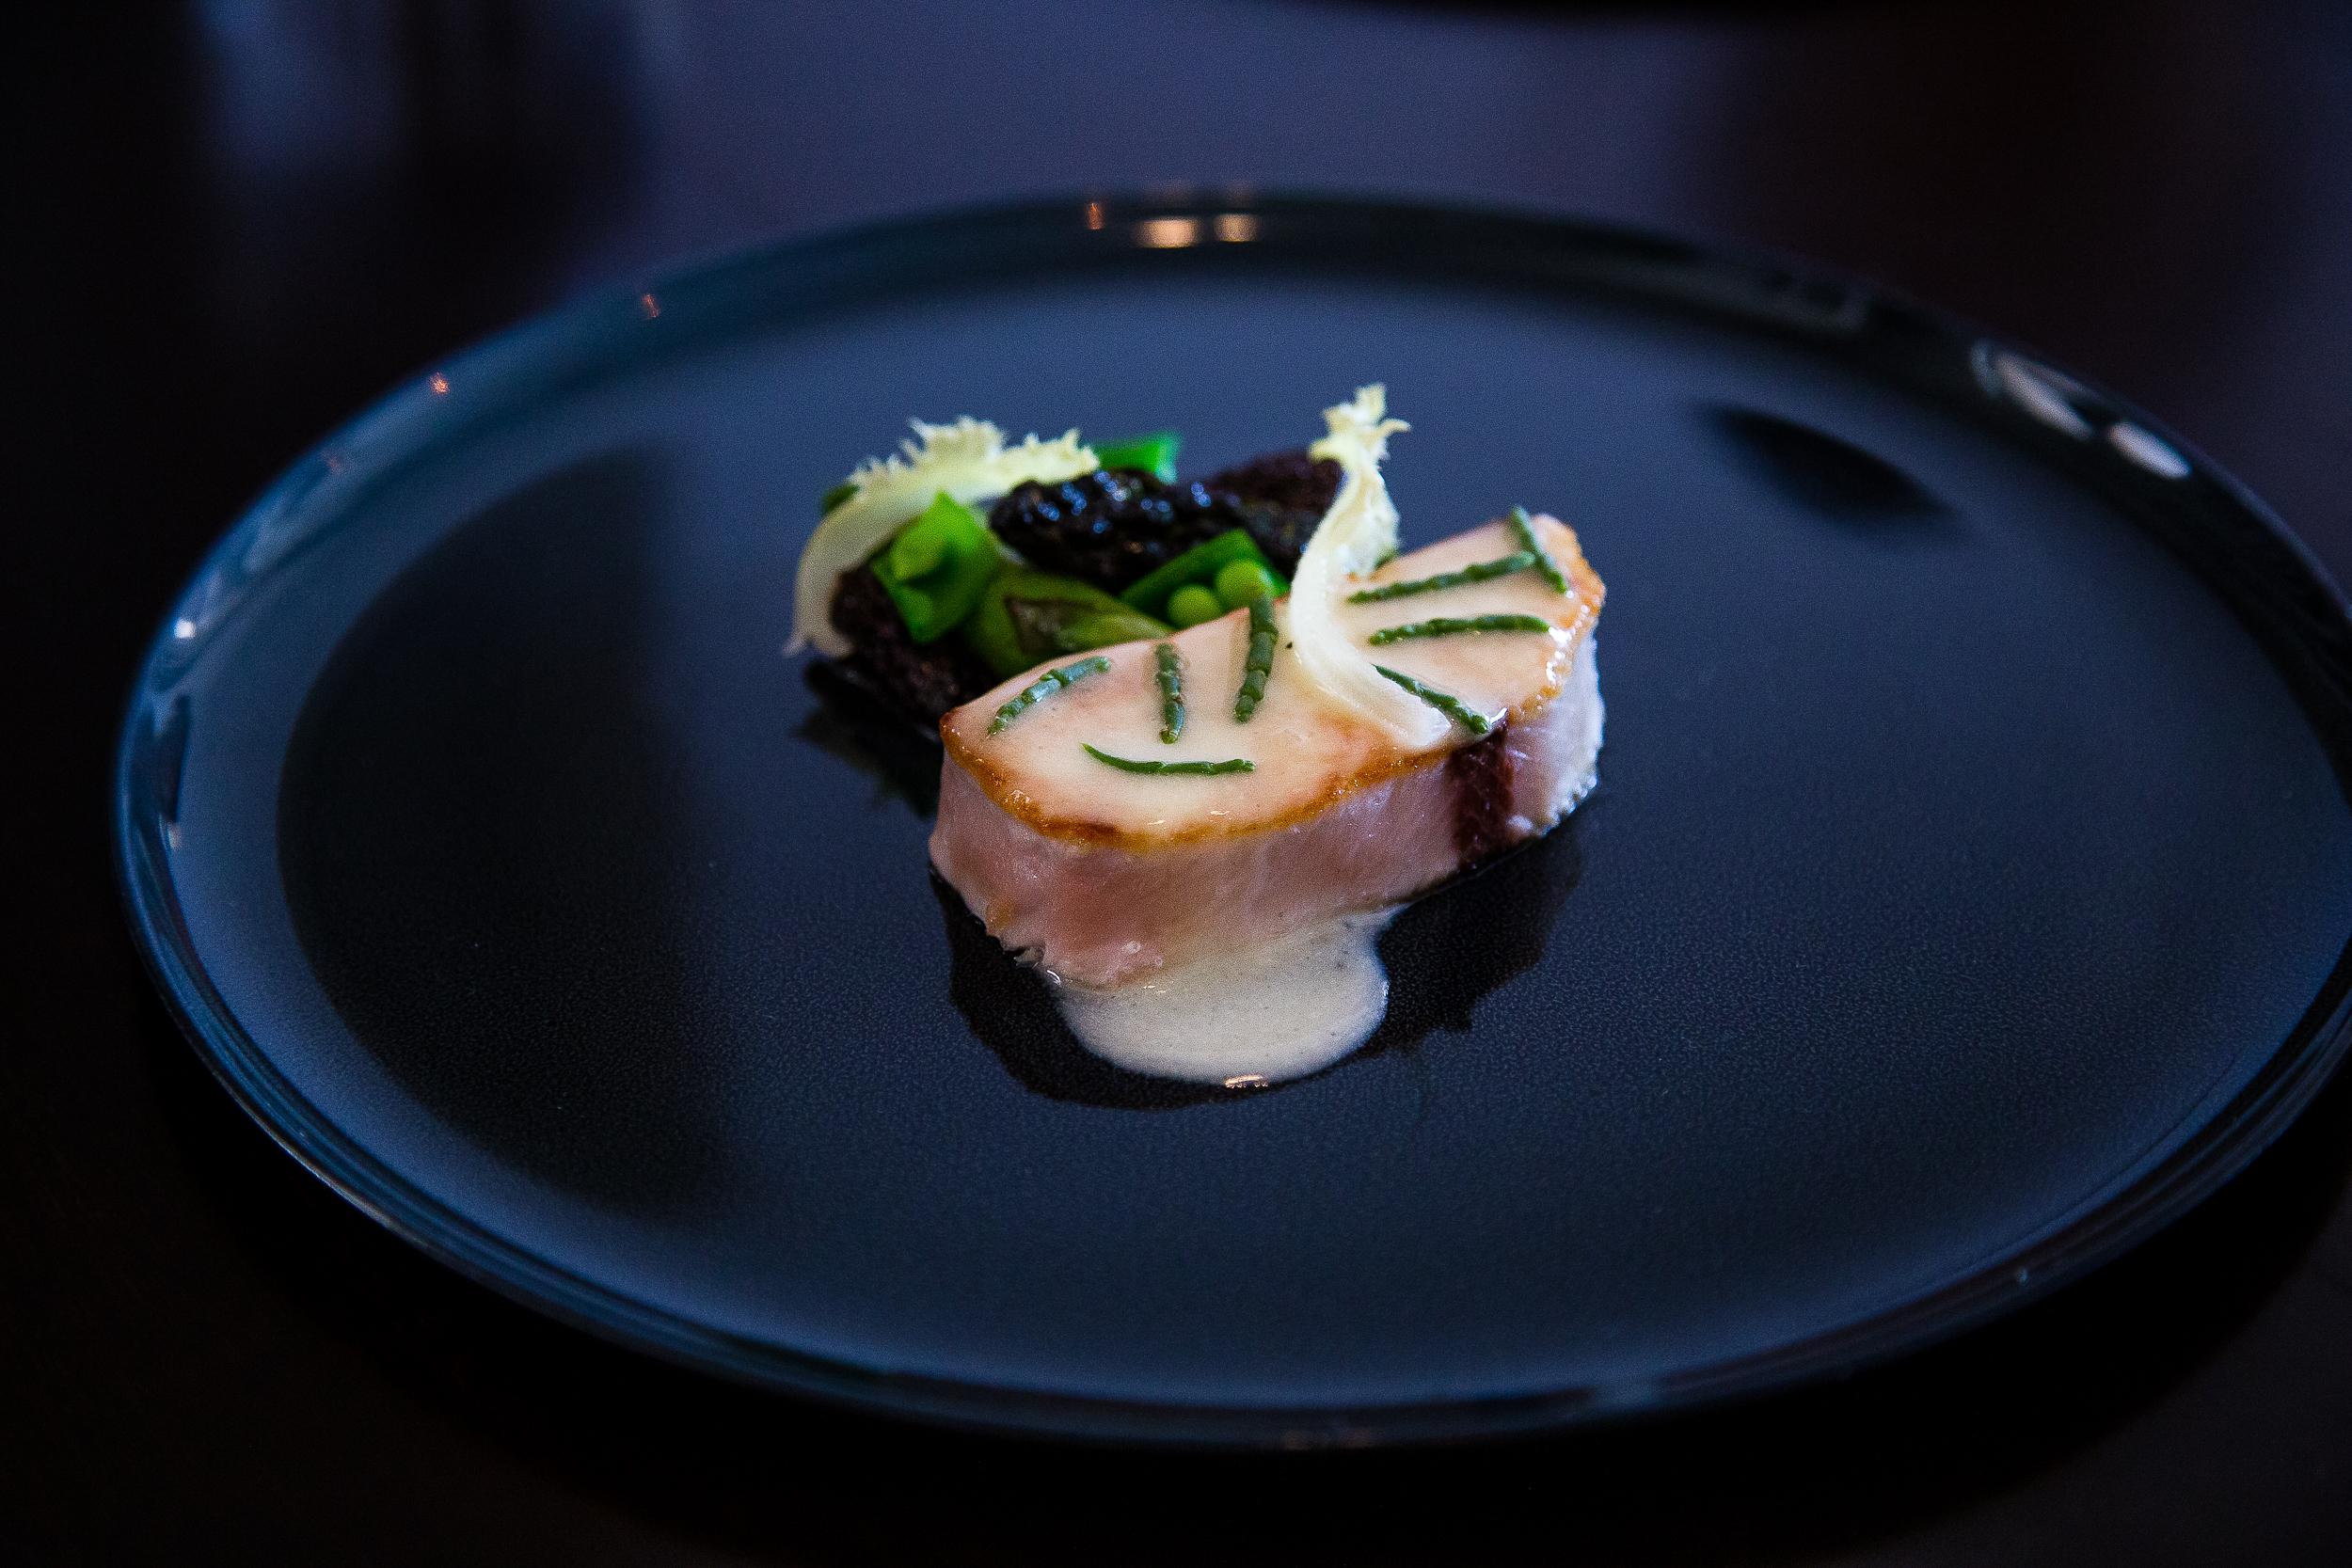 Amberjack hamachi, vermouth morels, asparagus